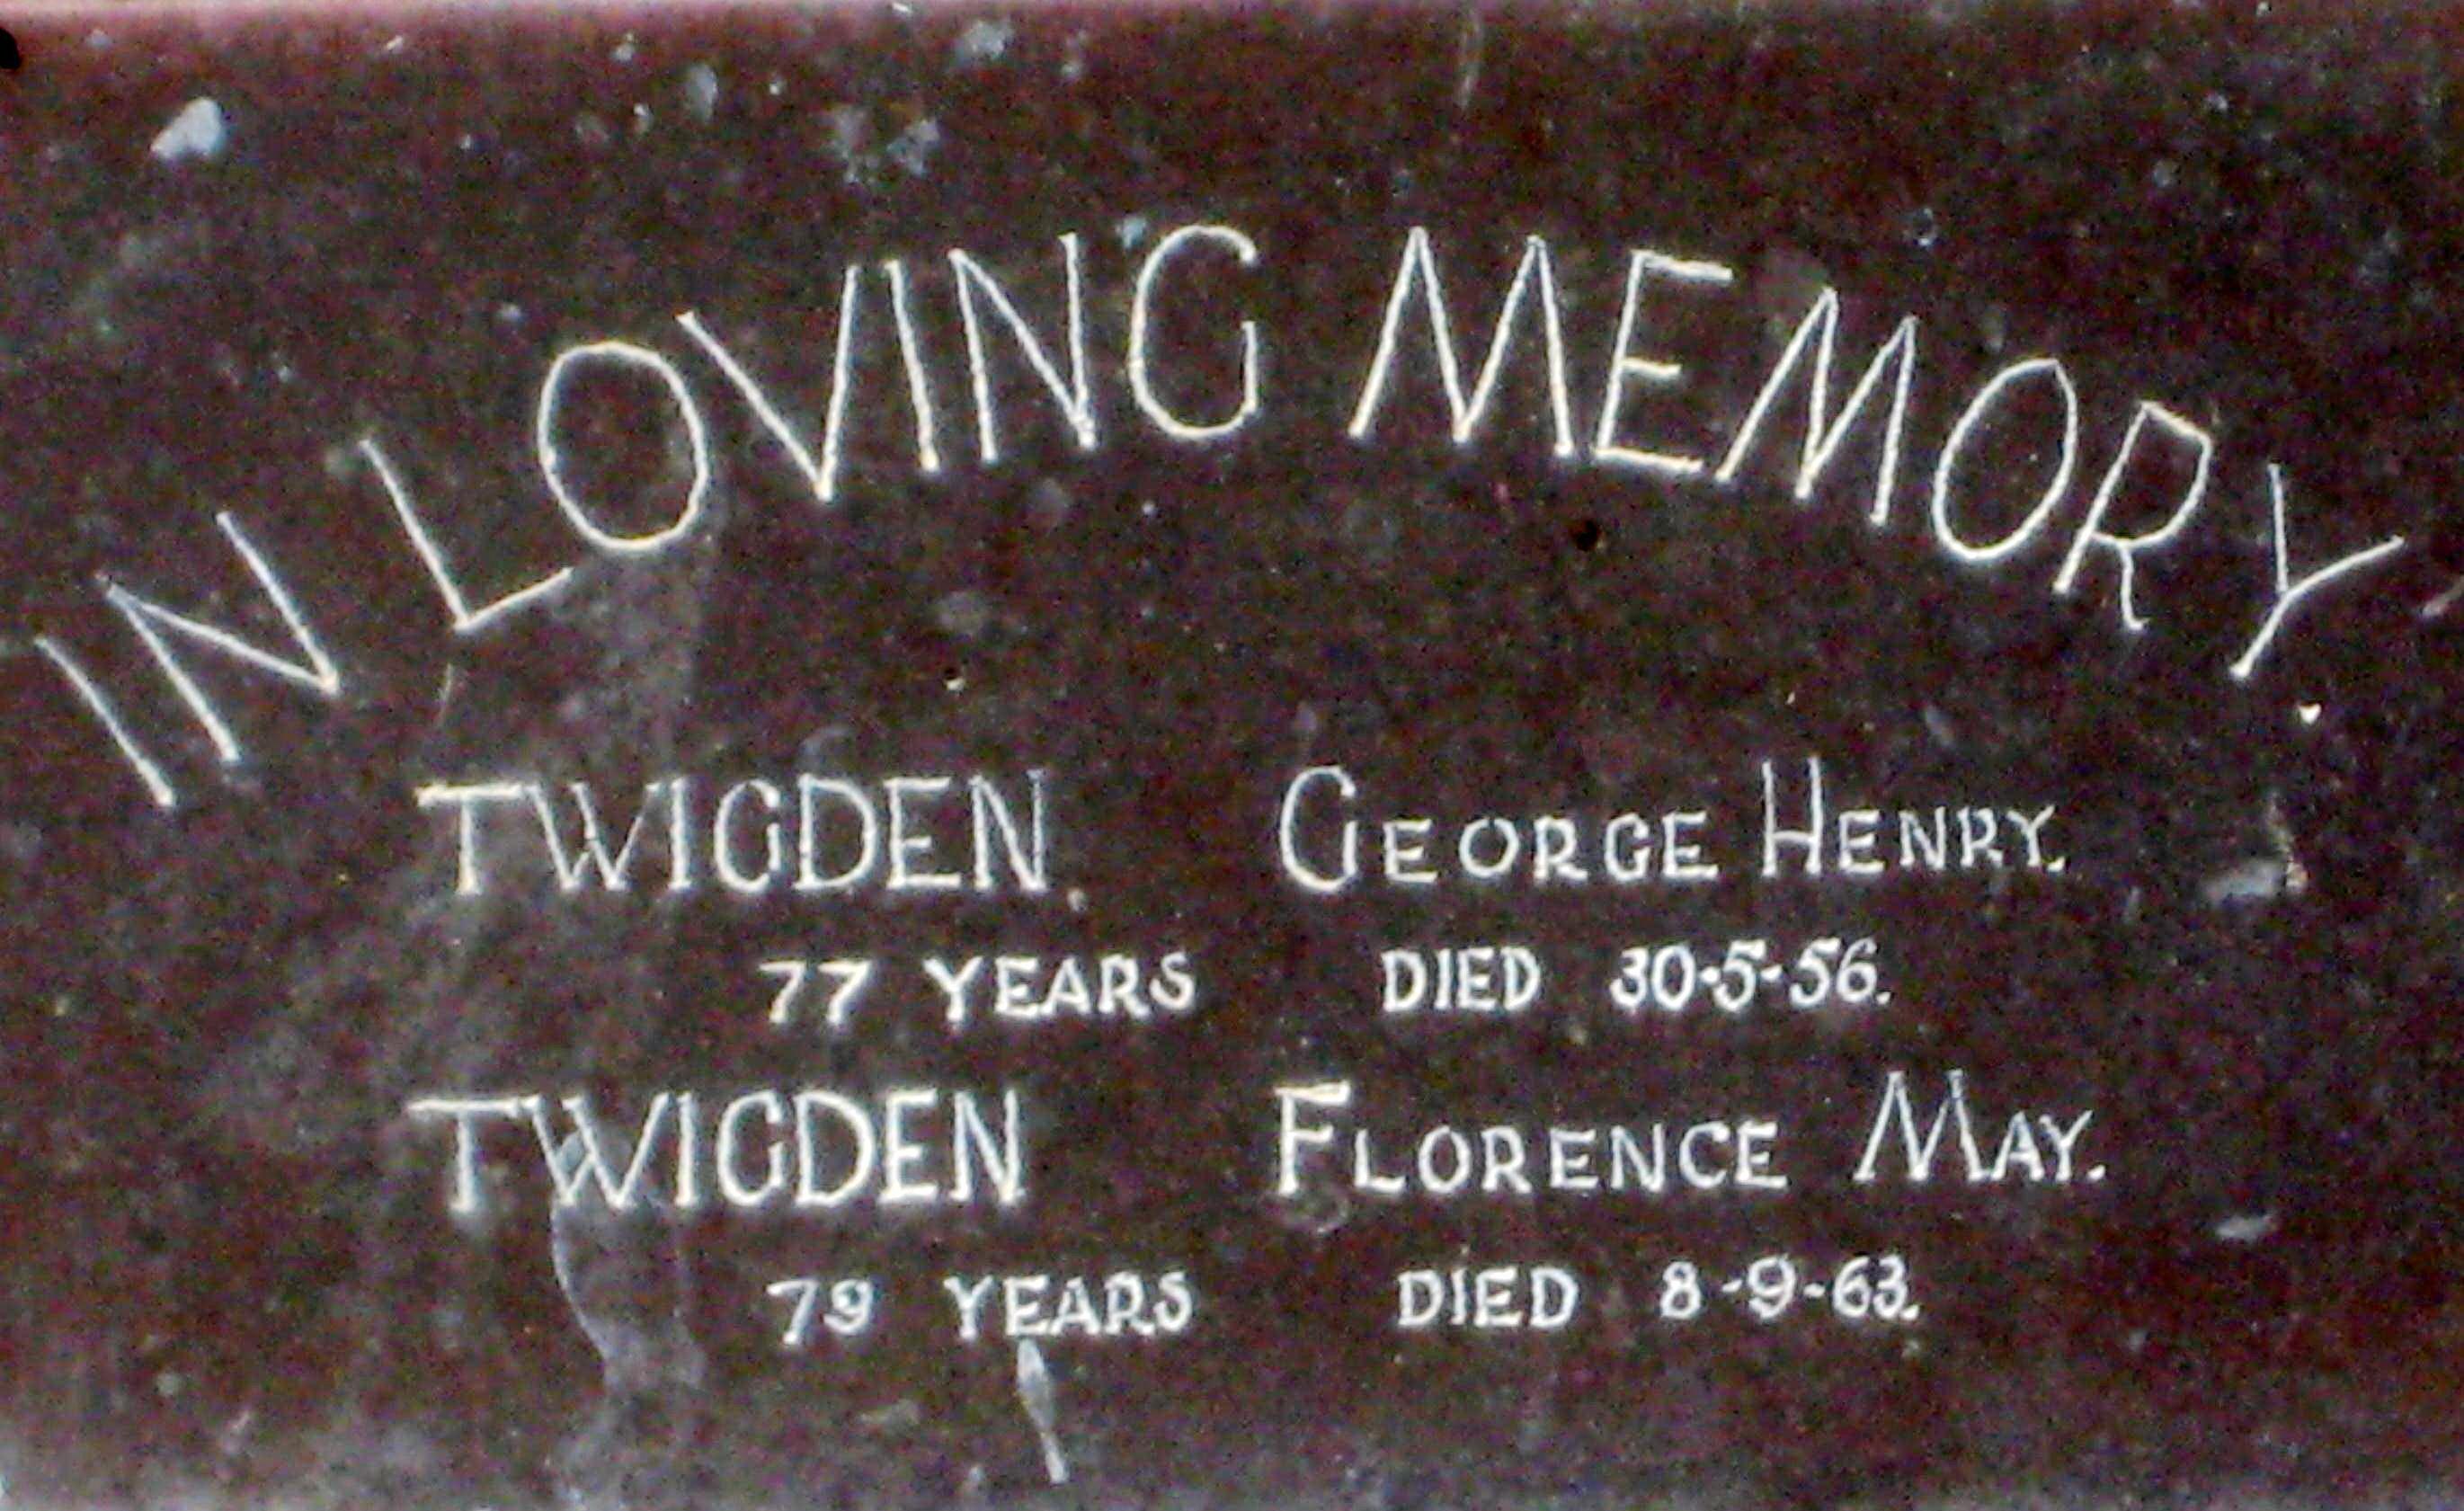 George Henry Twigden